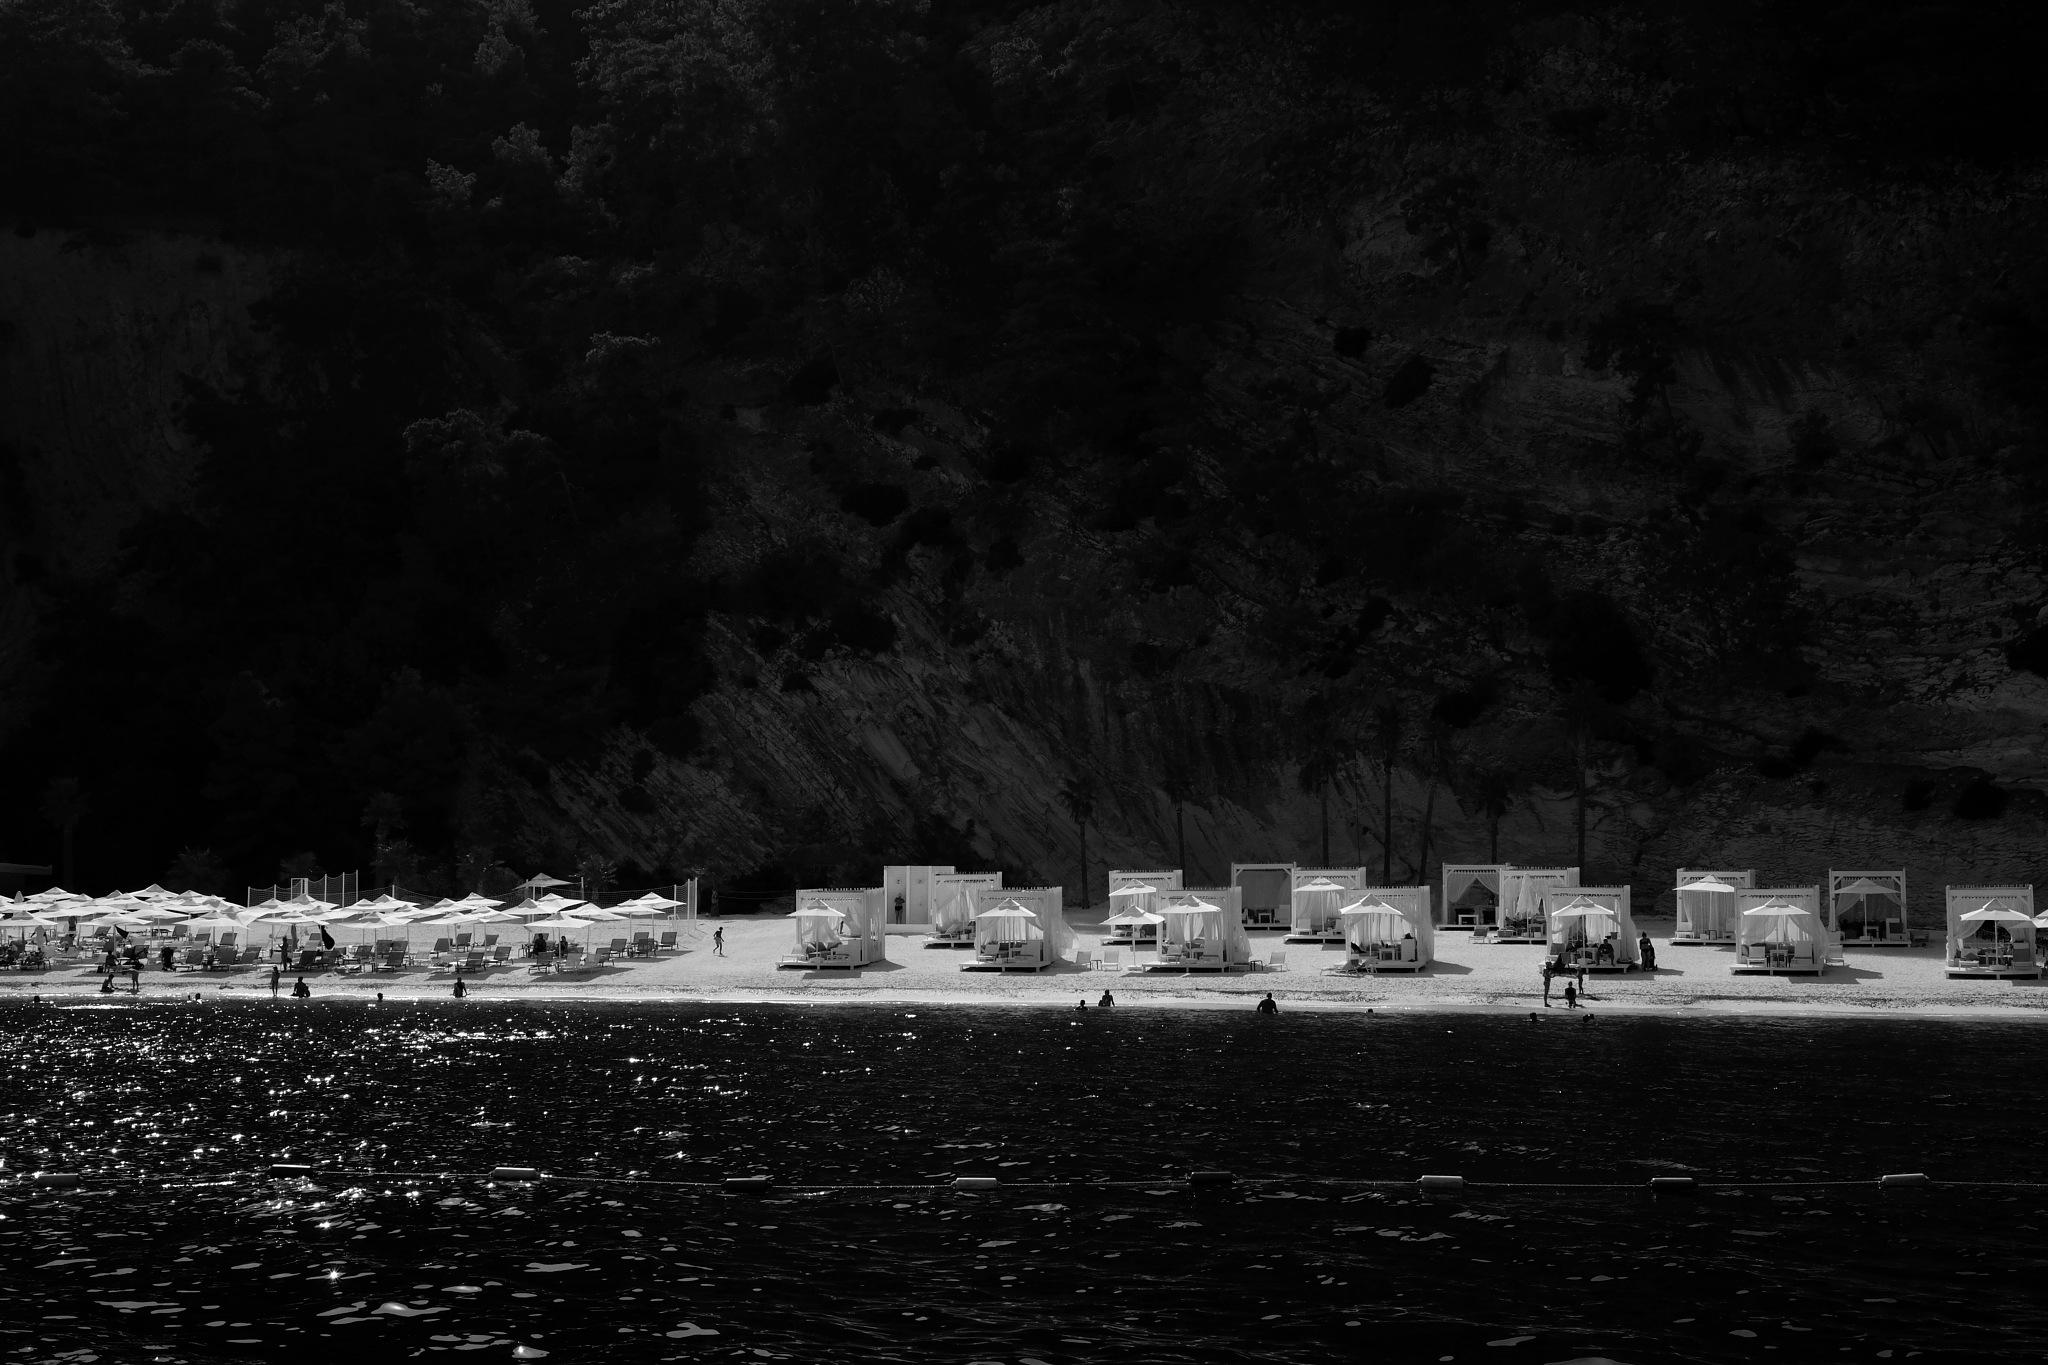 beach-facilities by Muhsin Özcan